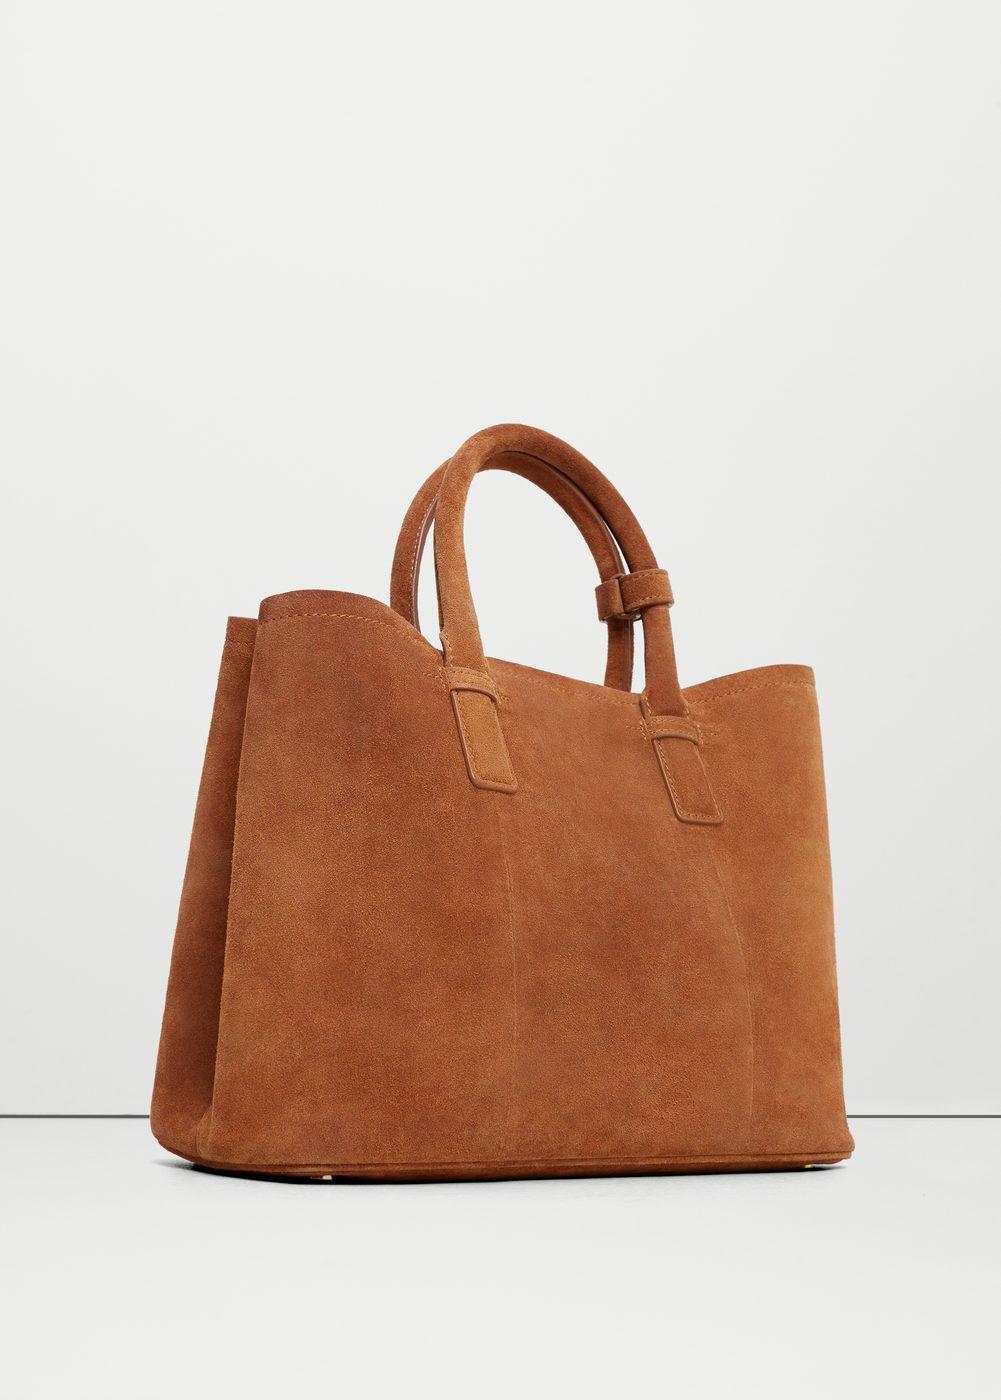 Bag WomenAccessories Leather Pinterest Shopper Handtassen F13TJlKc